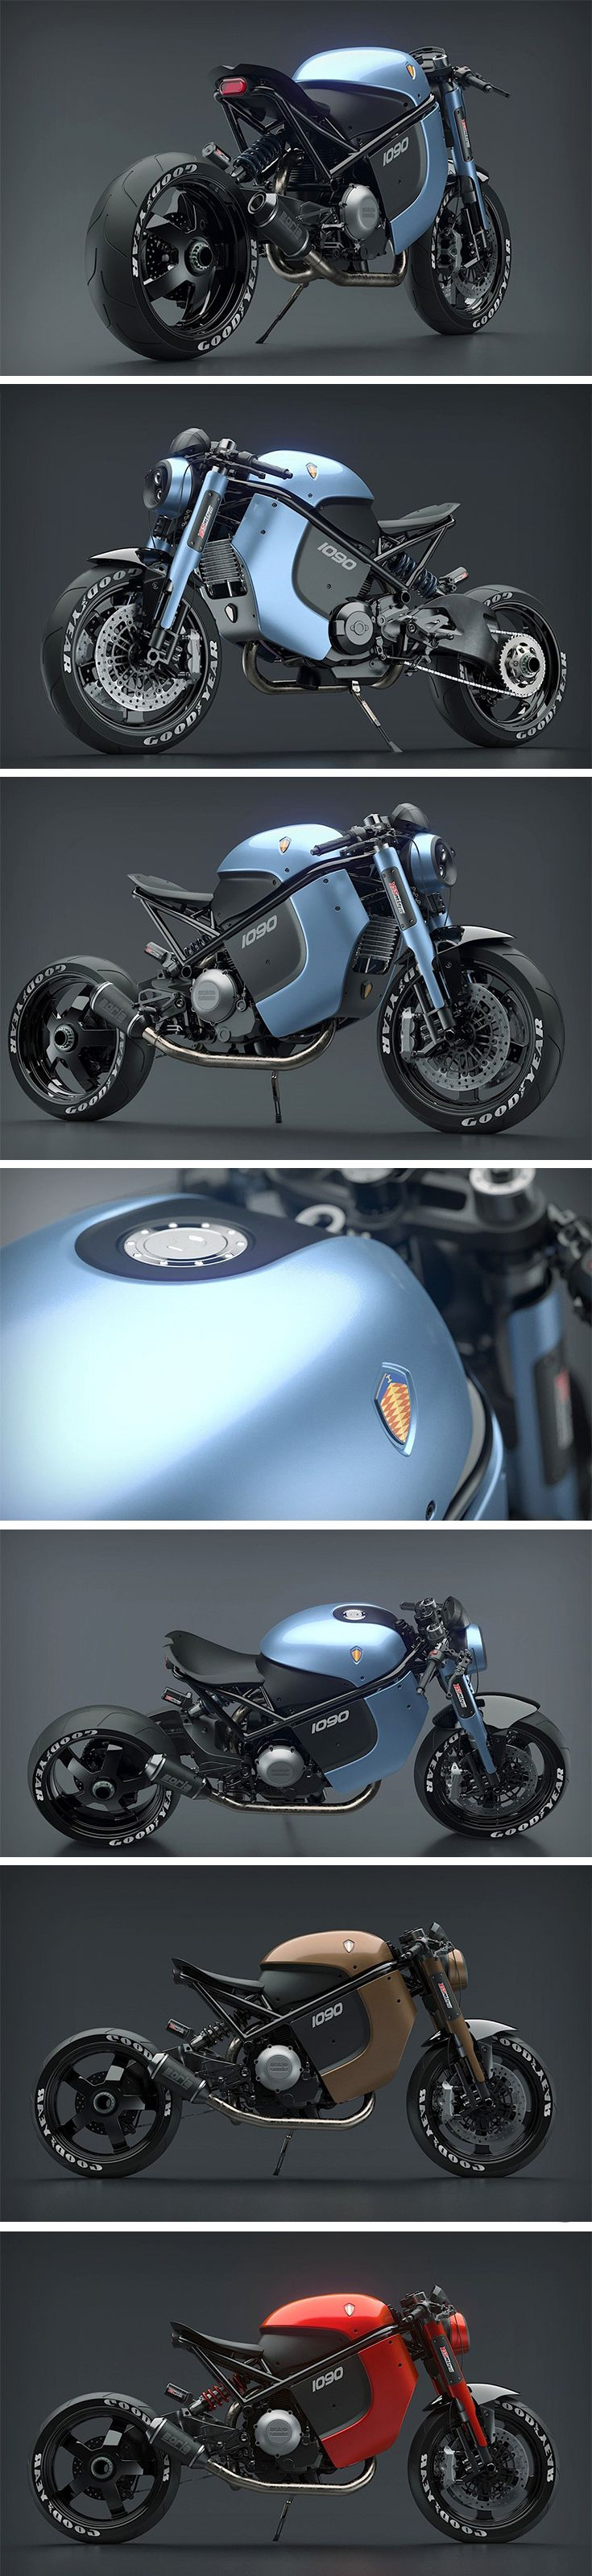 best 25 motorcycle art ideas on pinterest motorcycle cafe